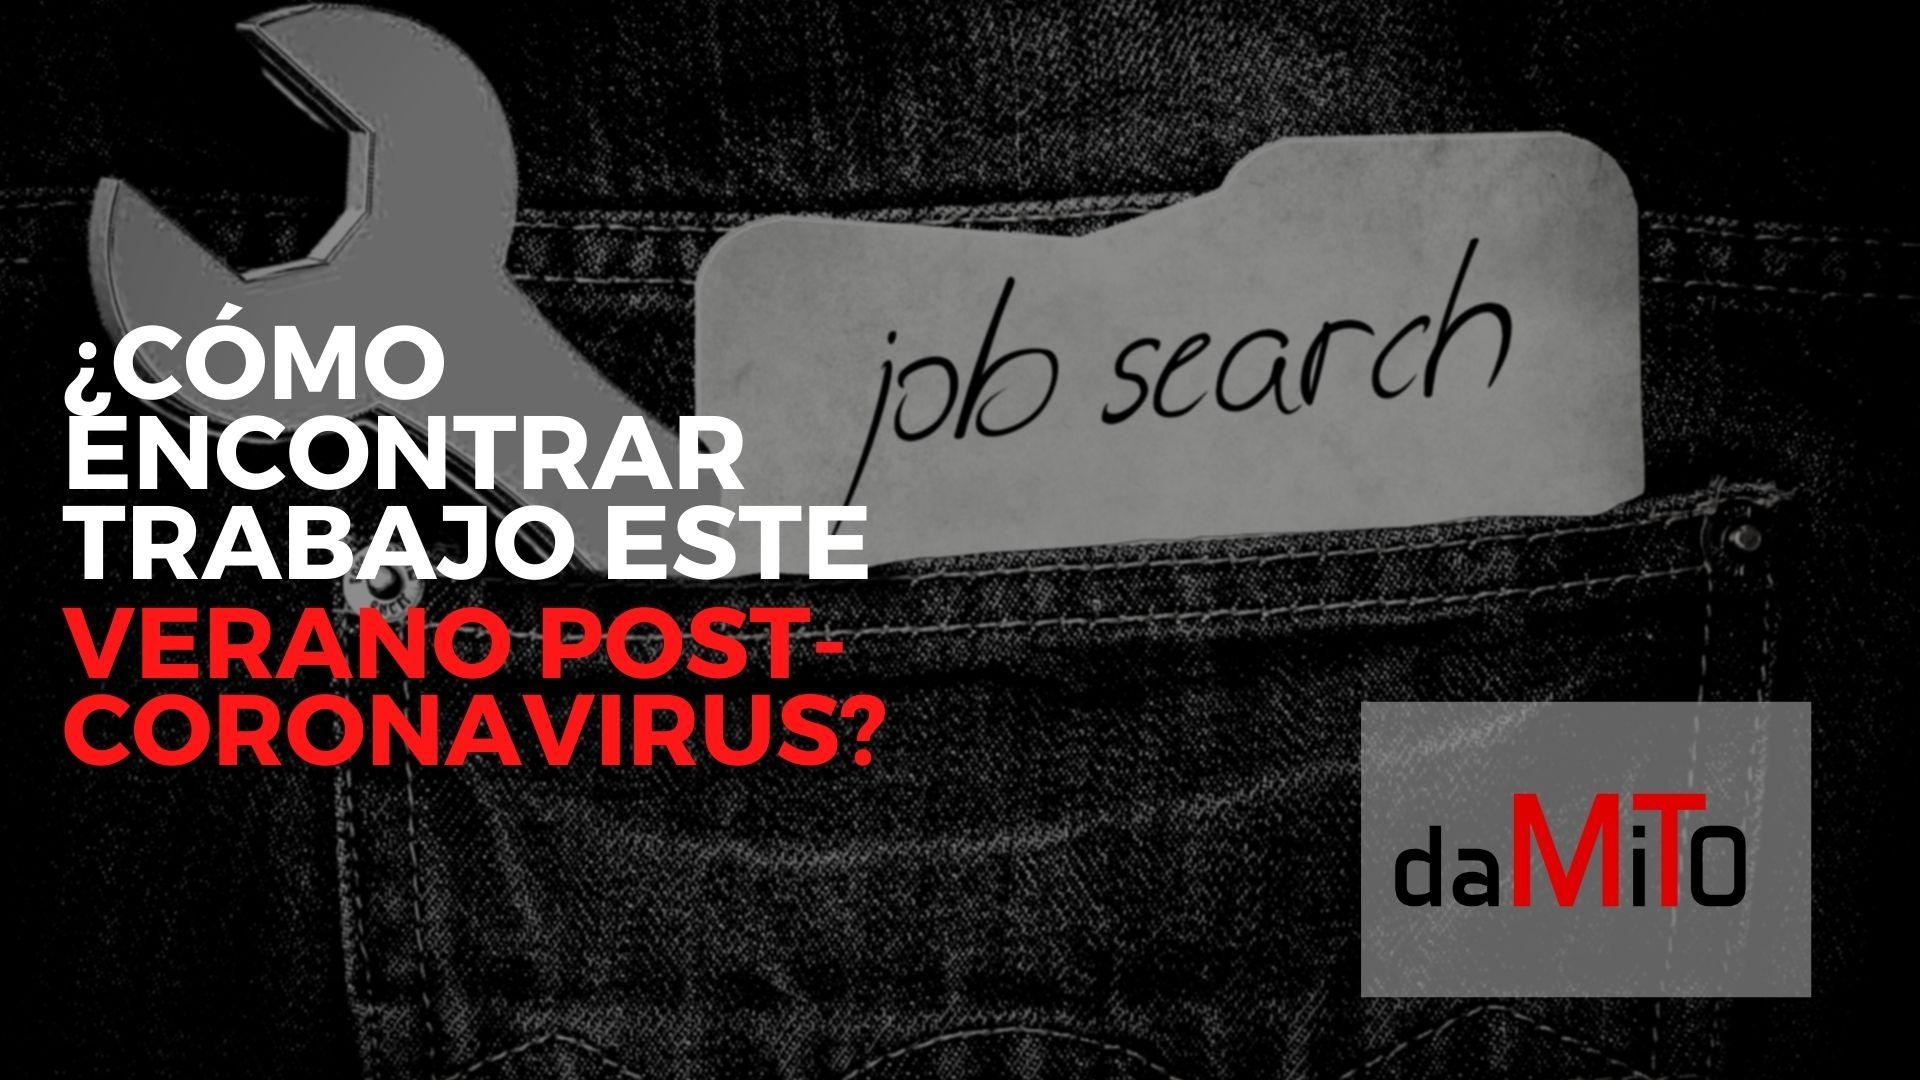 ¿Cómo encontrar trabajo este Verano Post-Coronavirus?